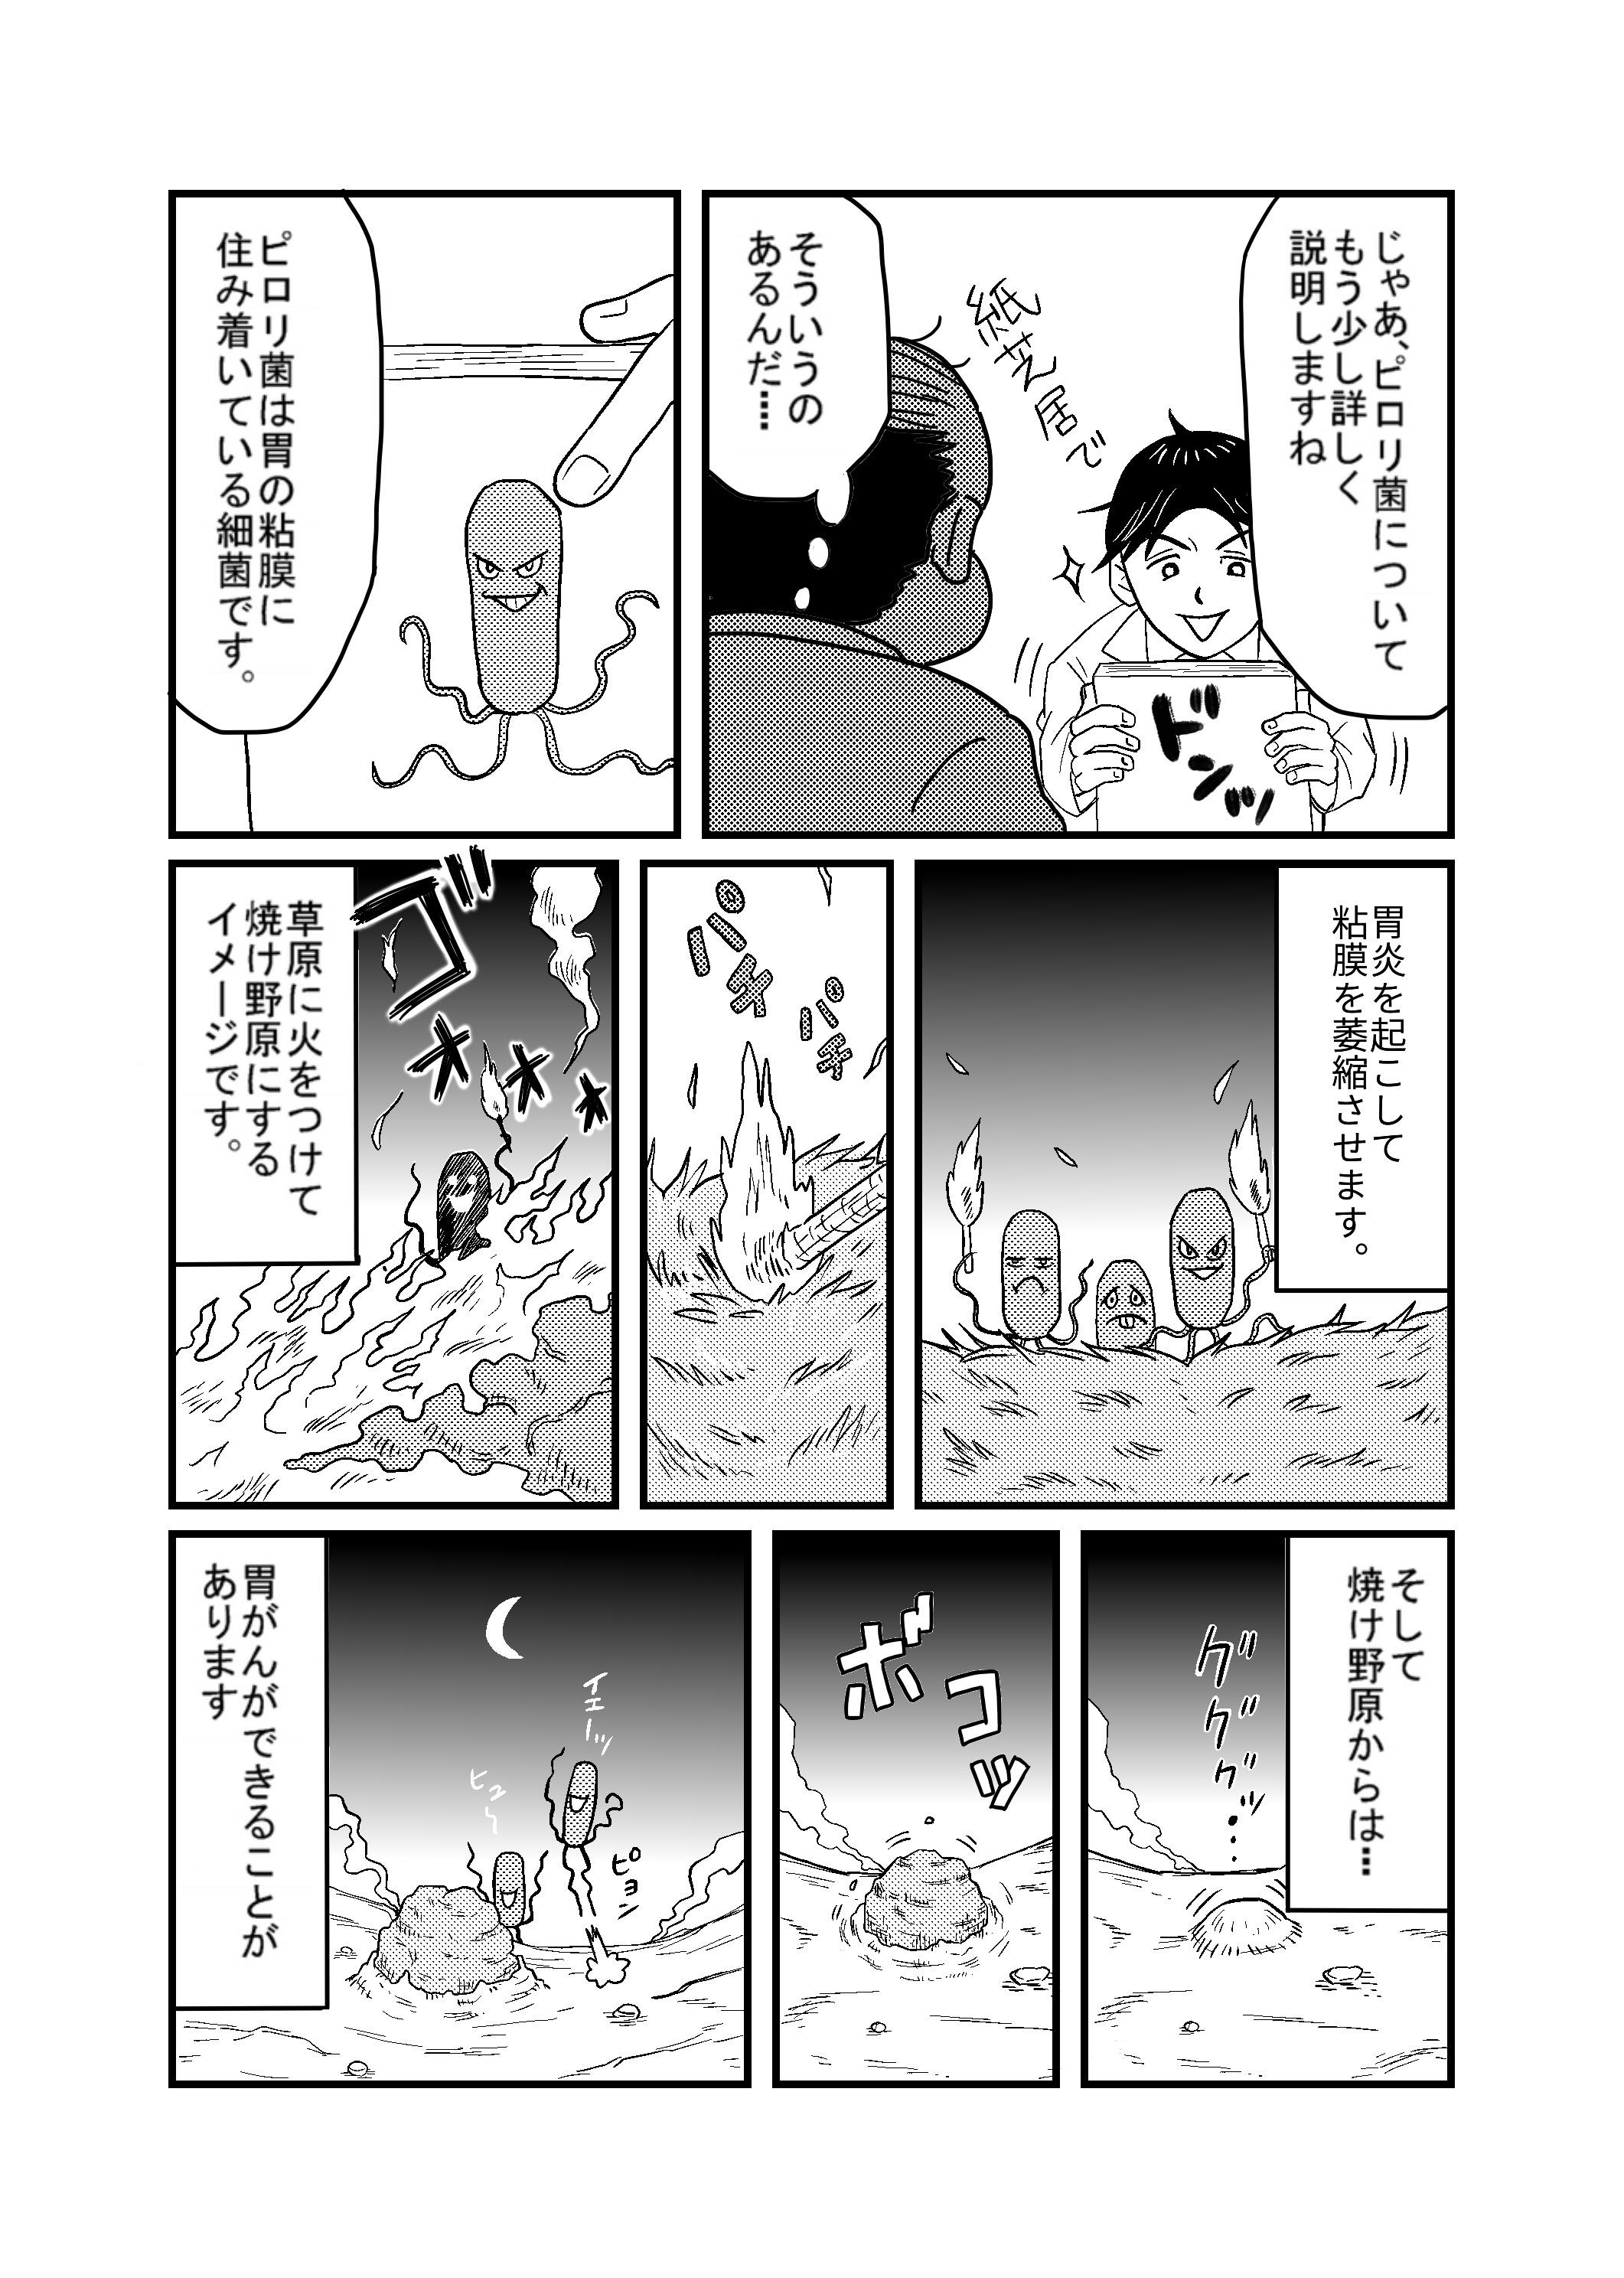 http://ikebukuro.books-sanseido.co.jp/ssd_wpc/uploads/2017/05/d135096942143ffc03cb2b83e41e269f.jpg